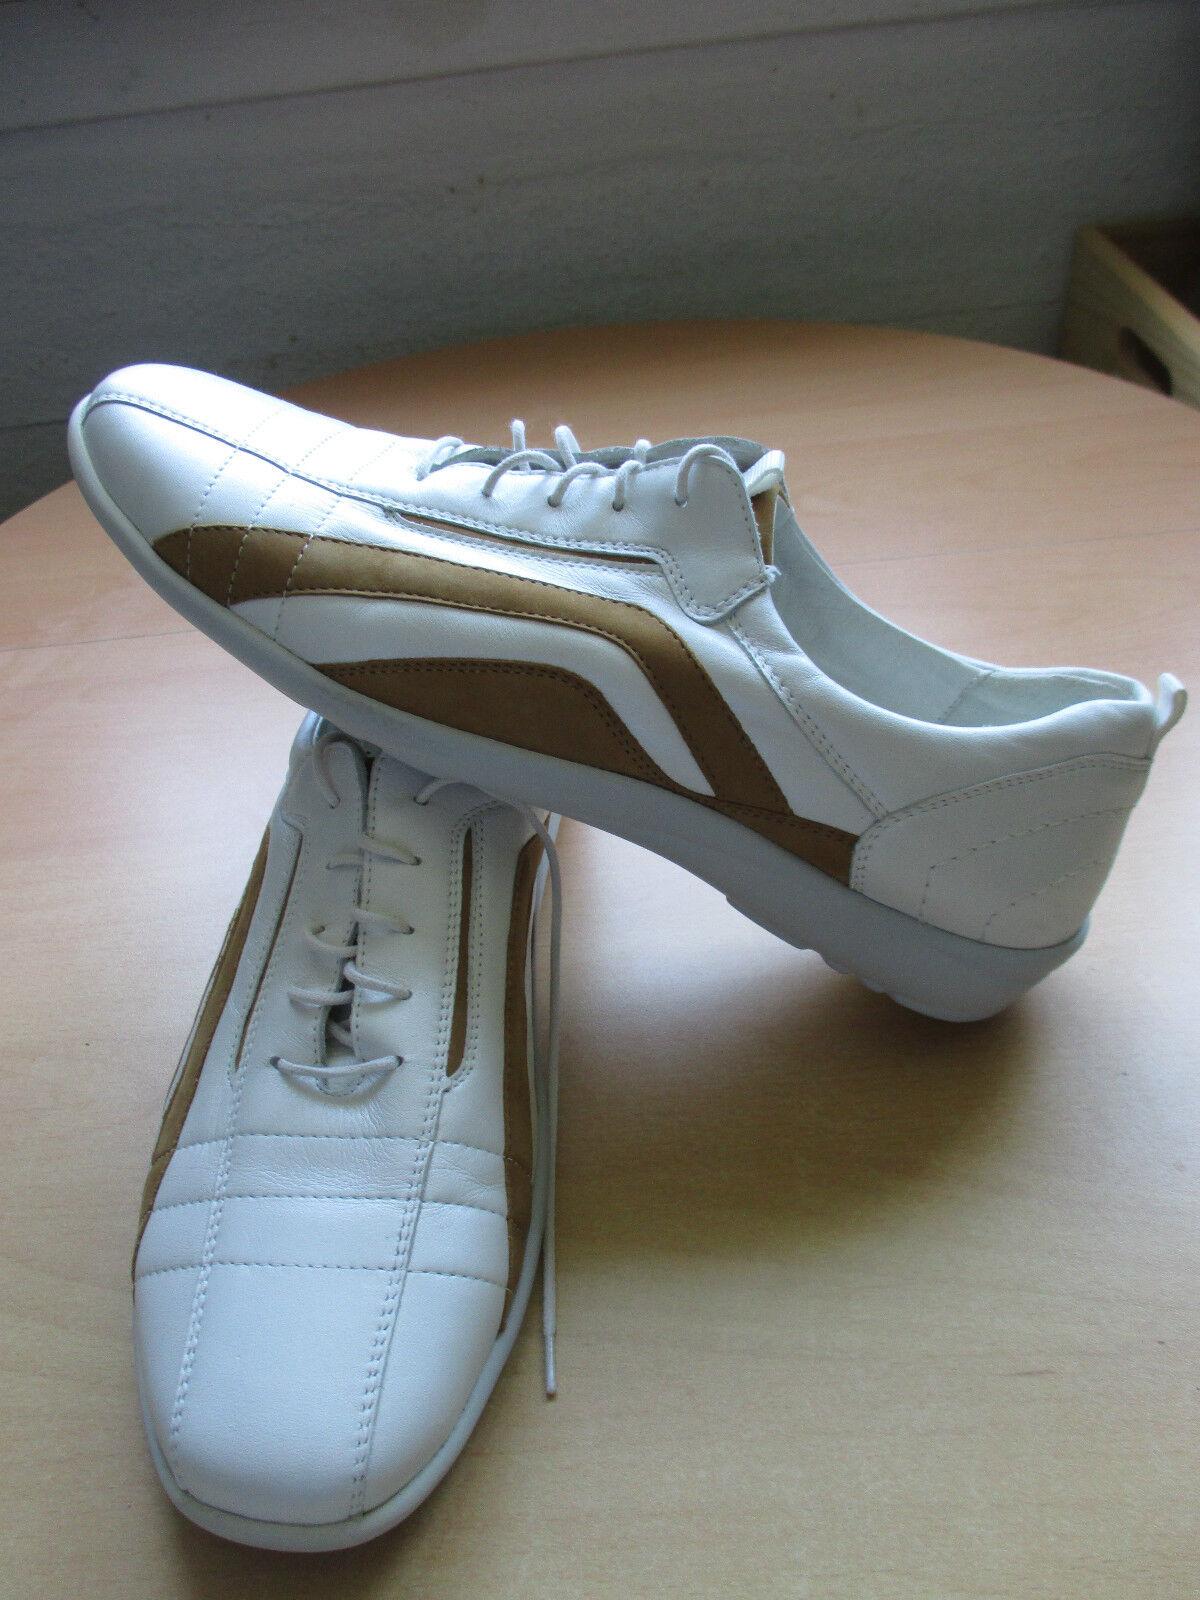 NUOVO alfiere foresta foresta foresta SCARPE DA DONNA scarpe da ginnastica LACCI TG. 7-41 G Bianco Cognac ZZ daac54